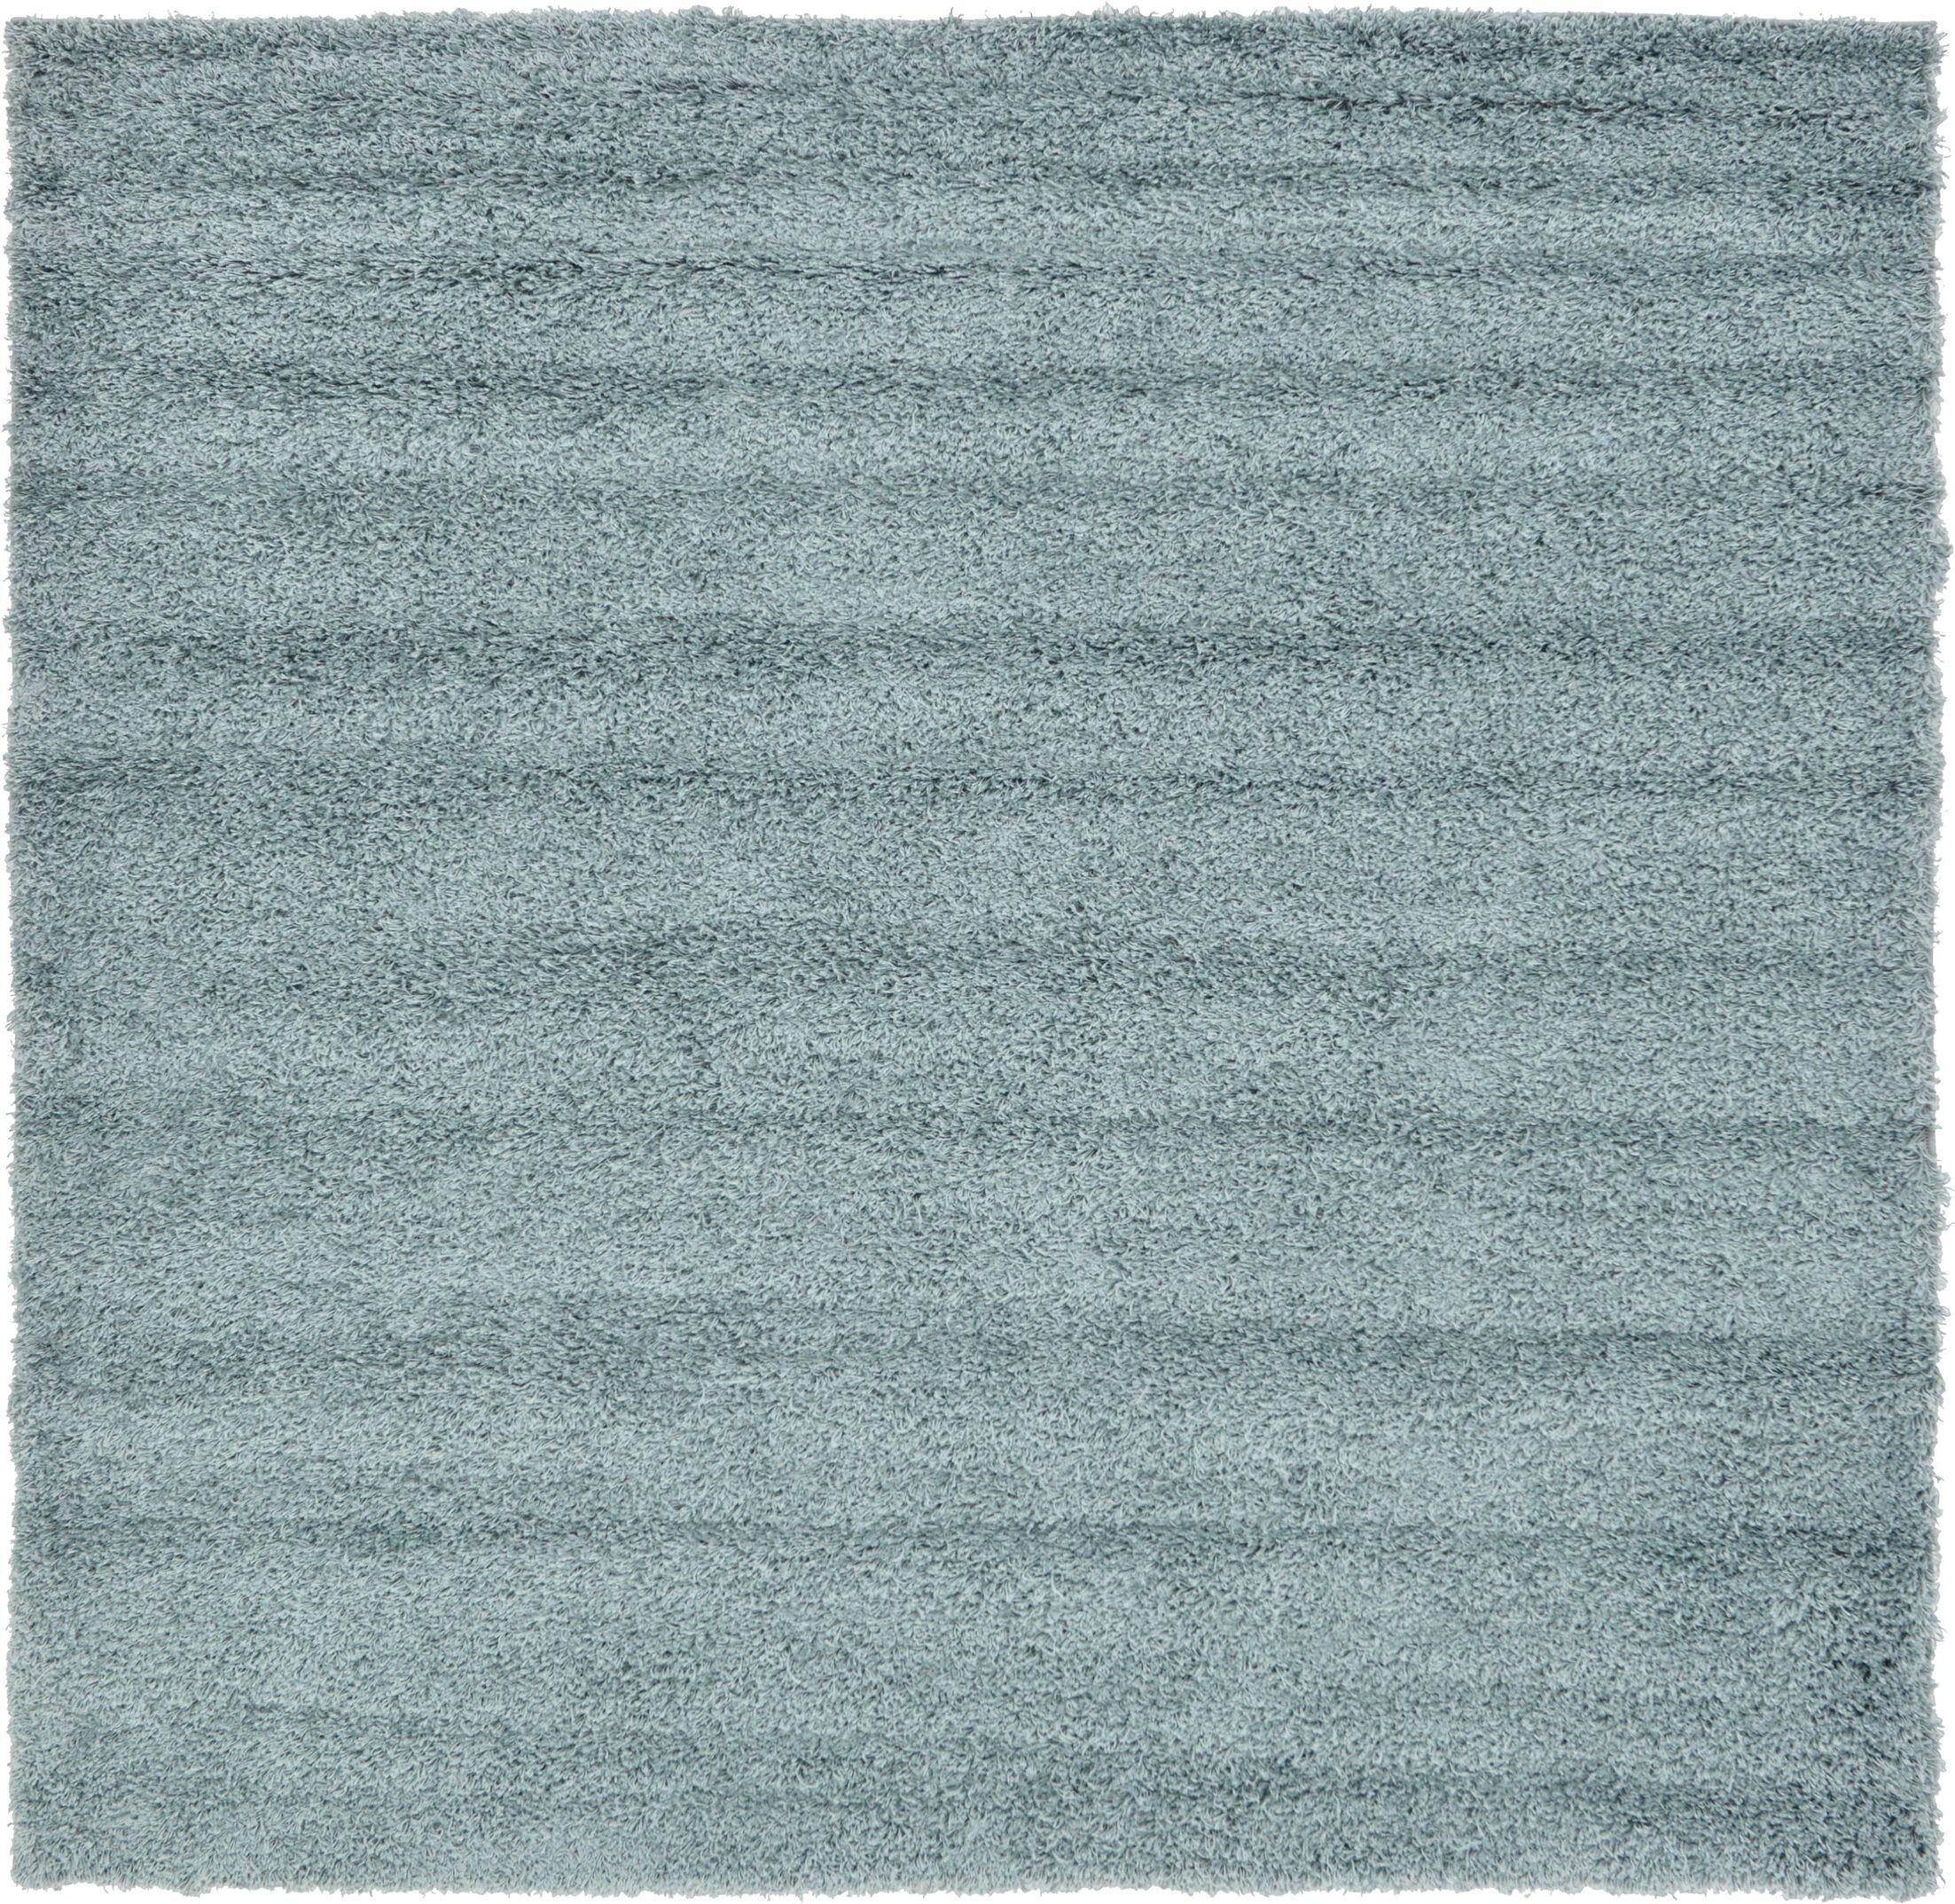 Lilah Light Blue Area Rug Rug Size: Square 8'2